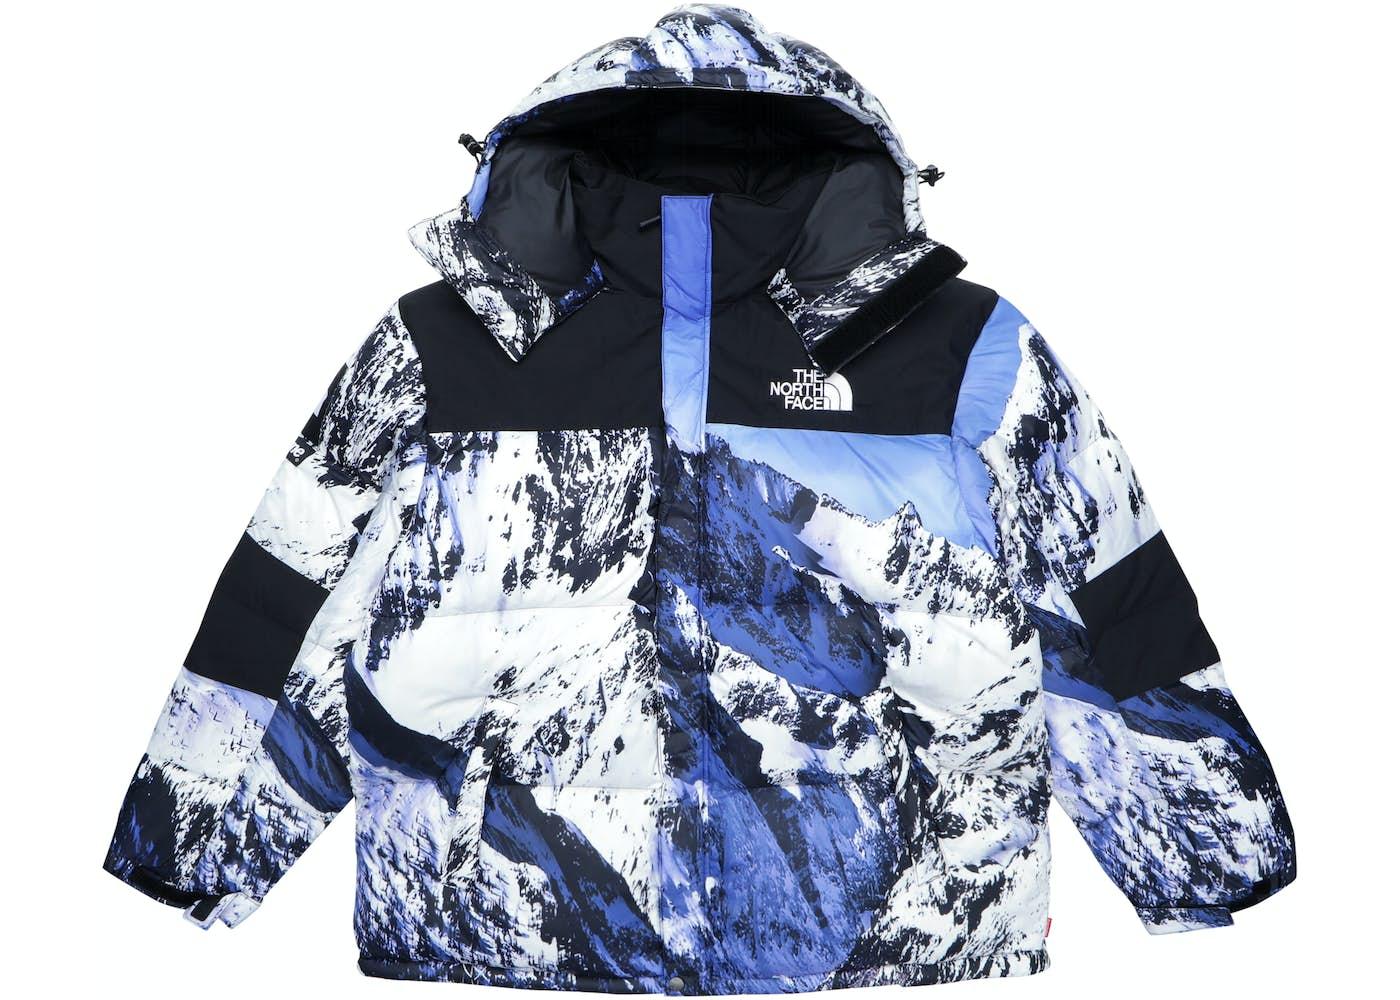 The north face mountain baltoro jacket bluewhite supreme the north face mountain baltoro jacket bluewhite buycottarizona